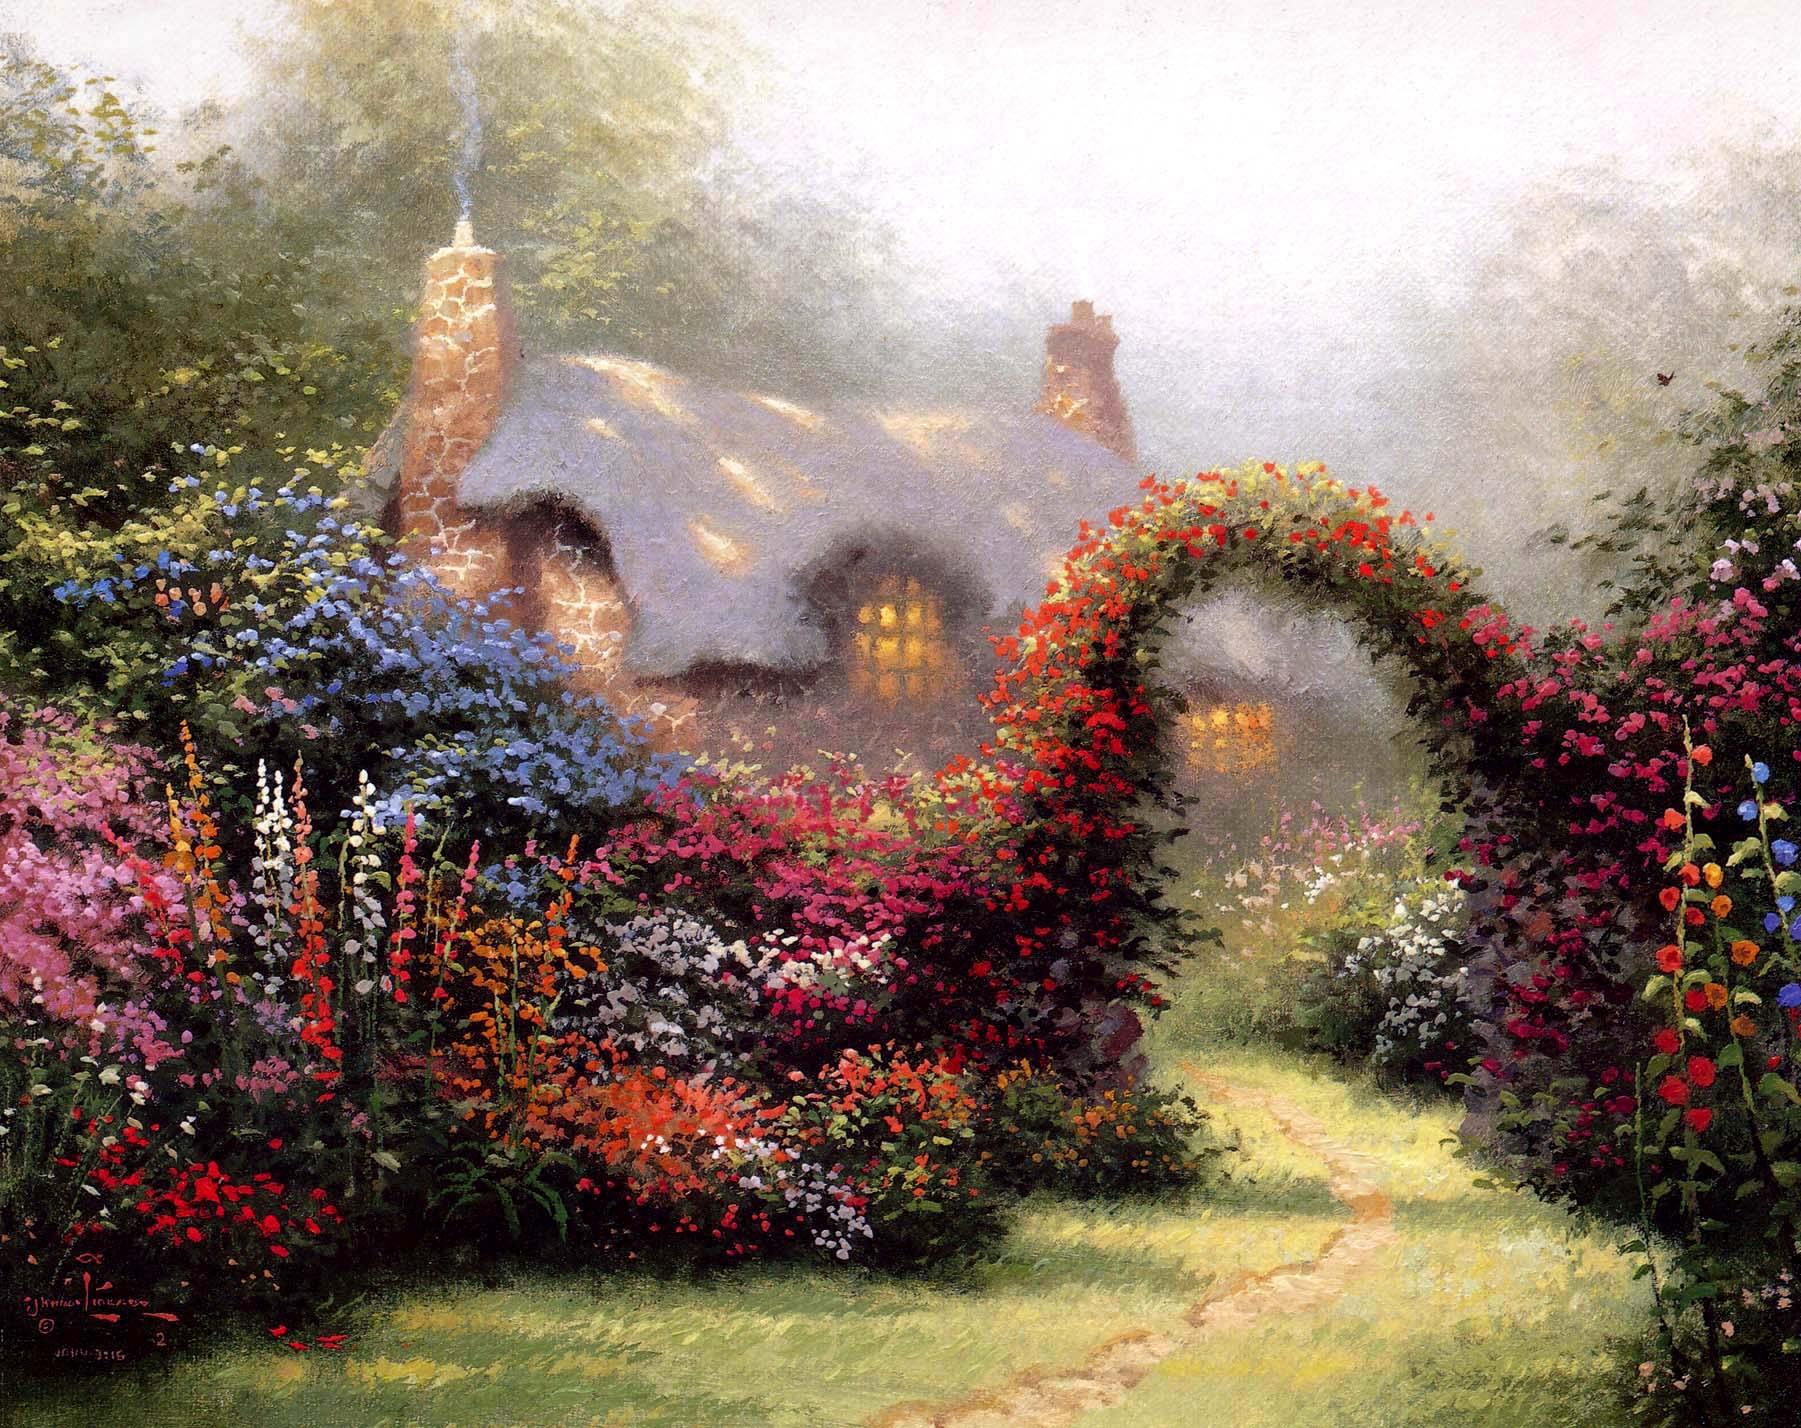 Сад желаний 2000 19 фотография